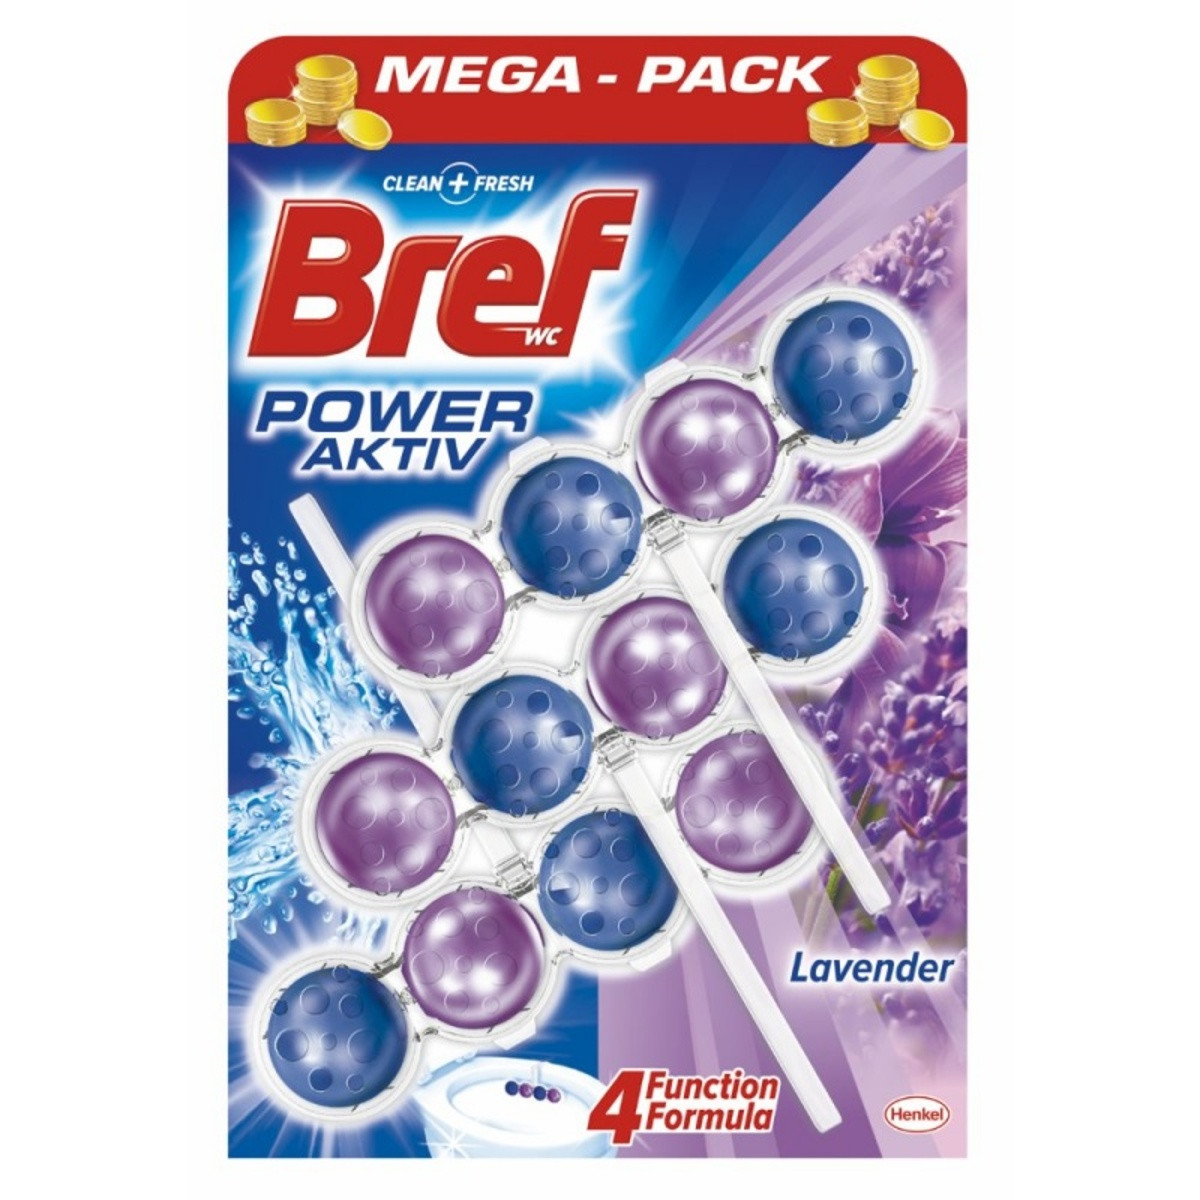 Кульки для унітазу Bref power aktiv lavender 3x50 г